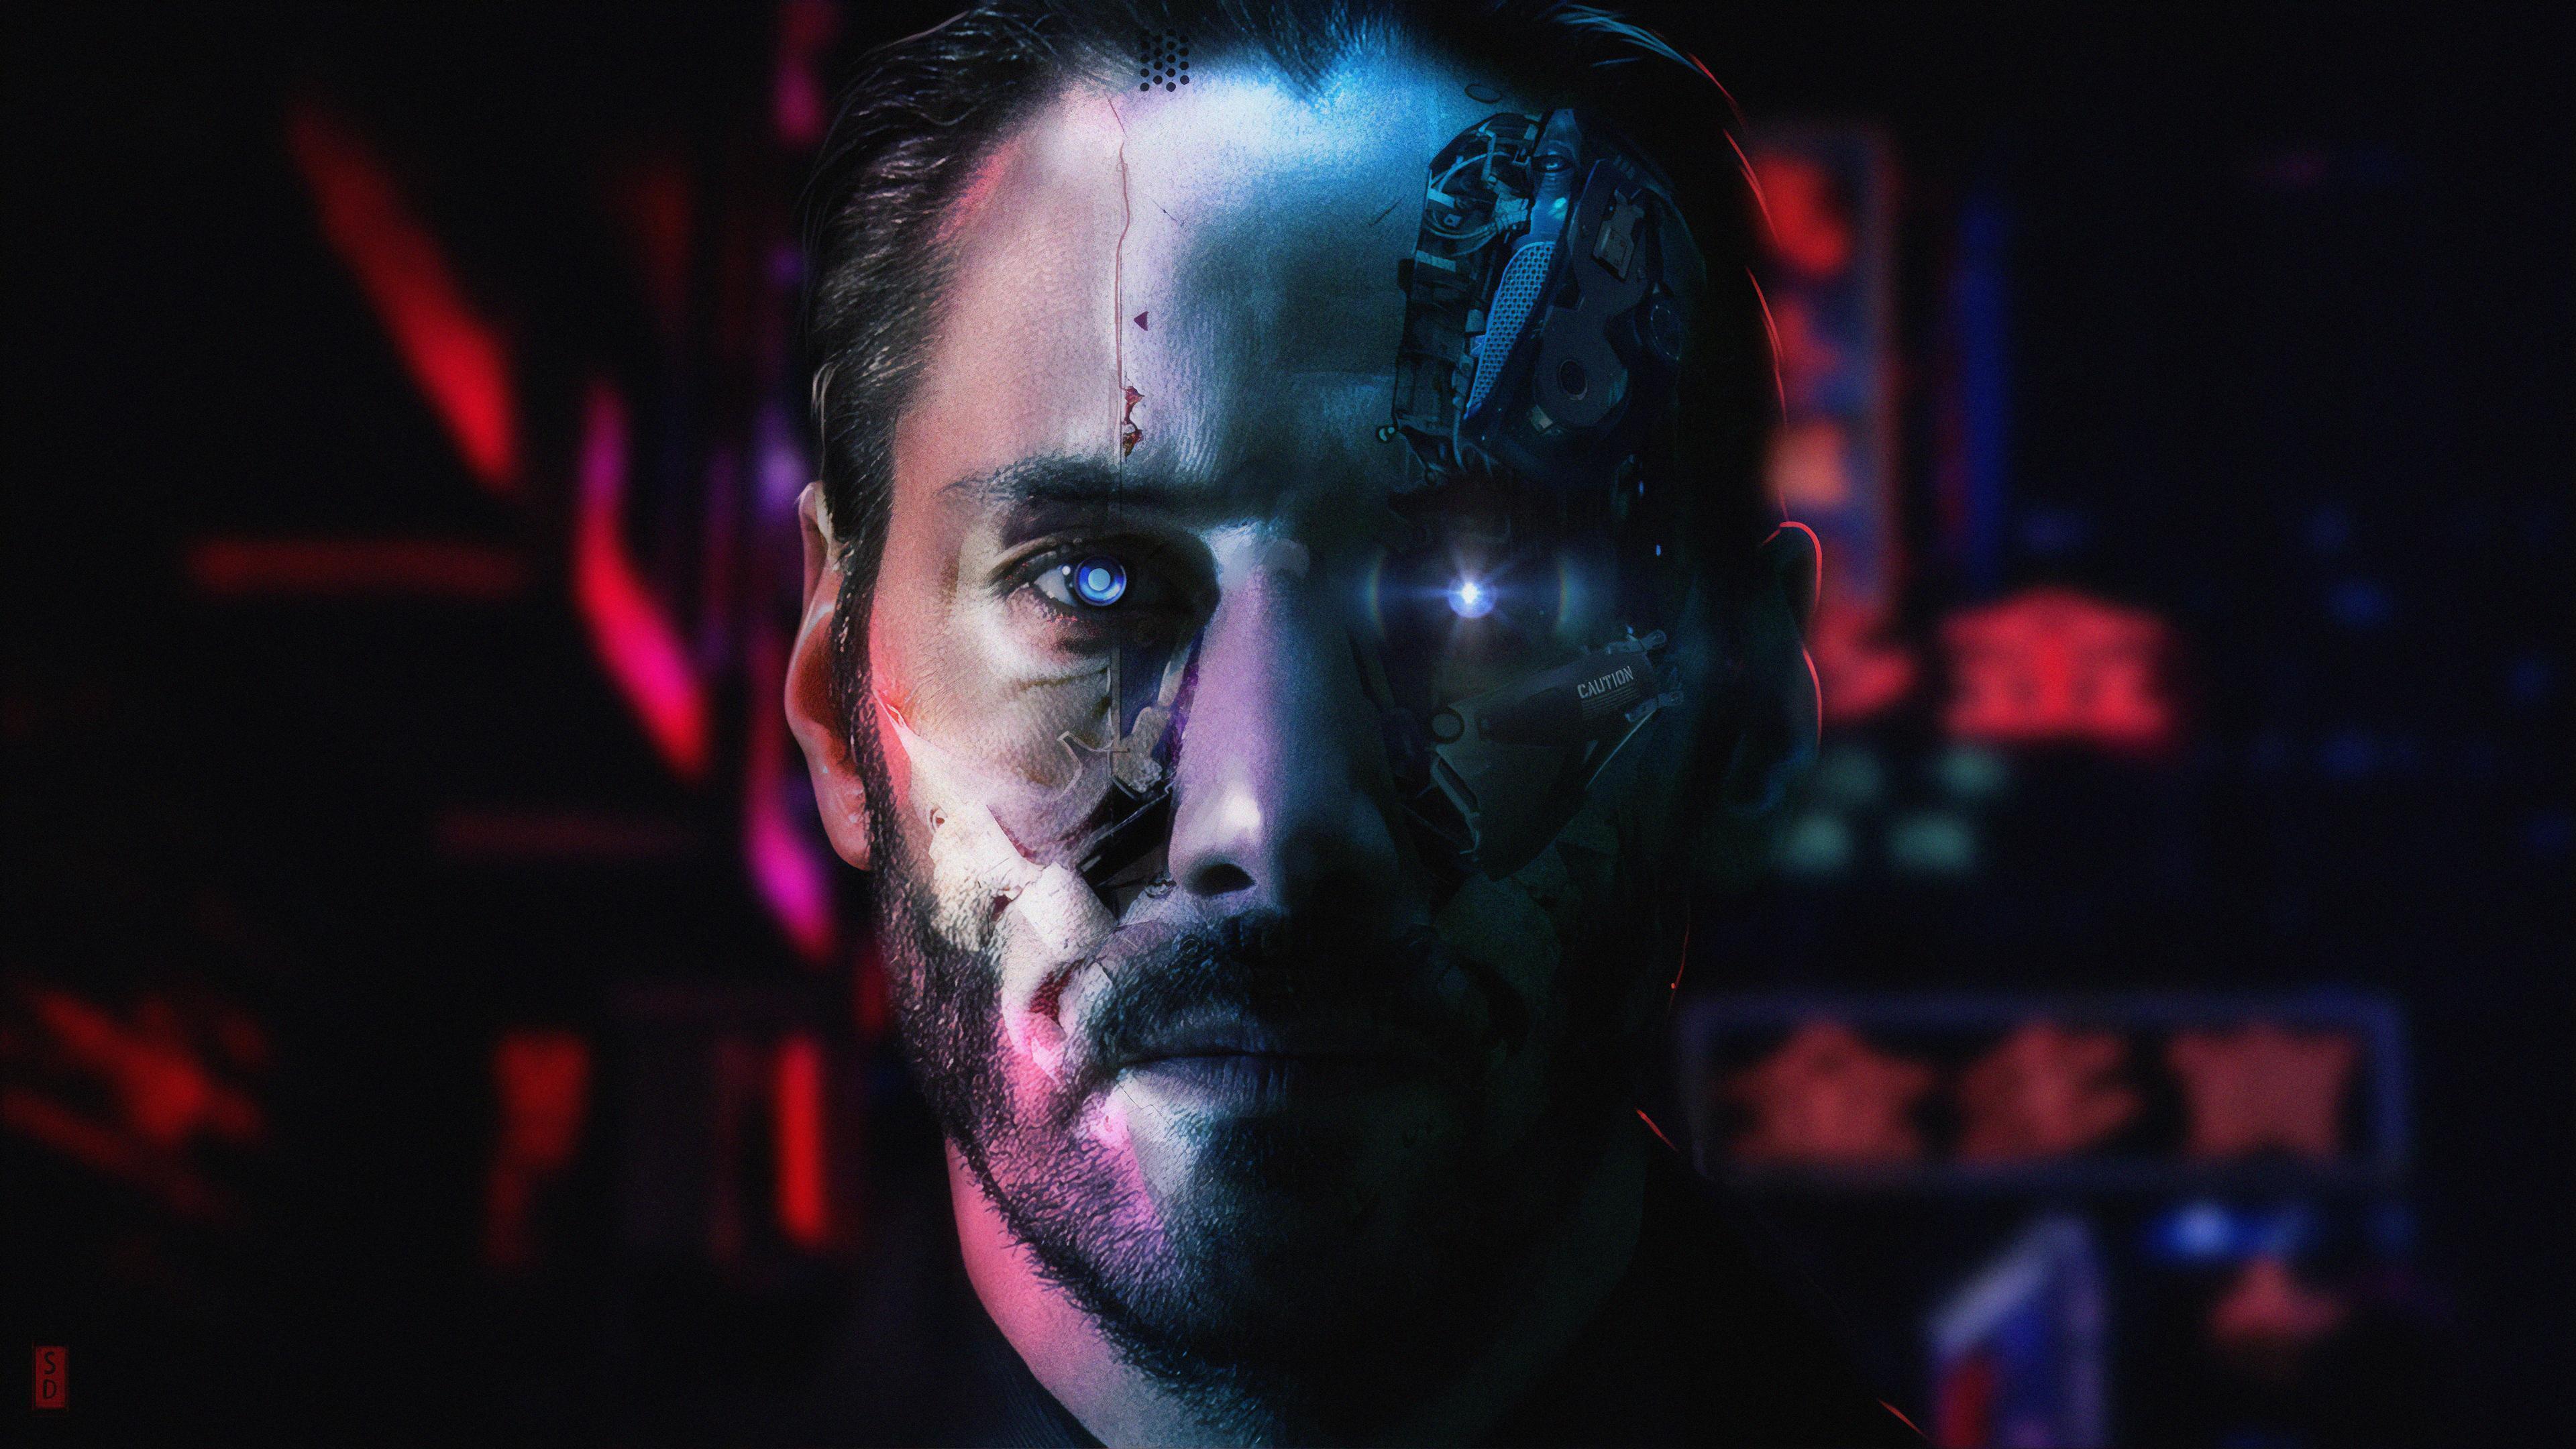 John Wick Cyberpunk Wallpapers - Wallpaper Cave